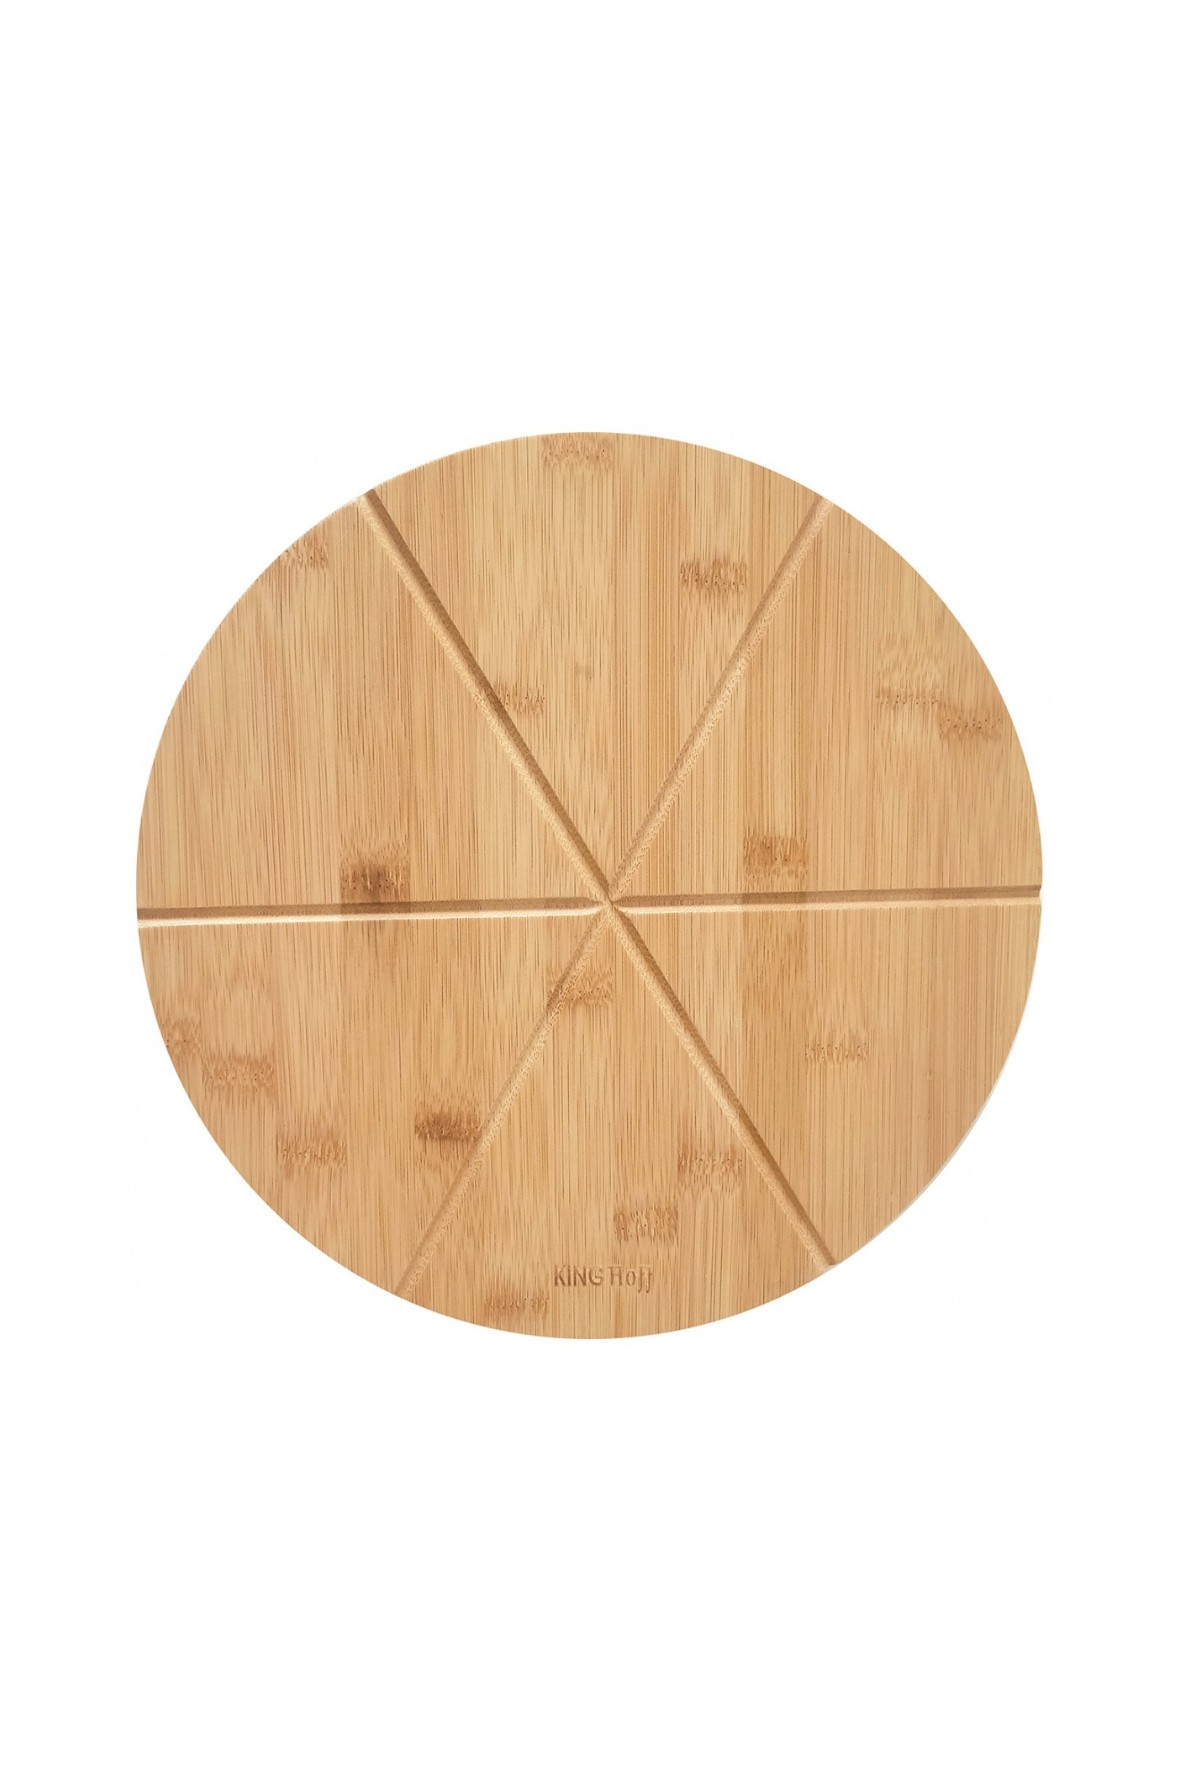 KINGHOFFTaca deska bambusowa do pizzy 35cm